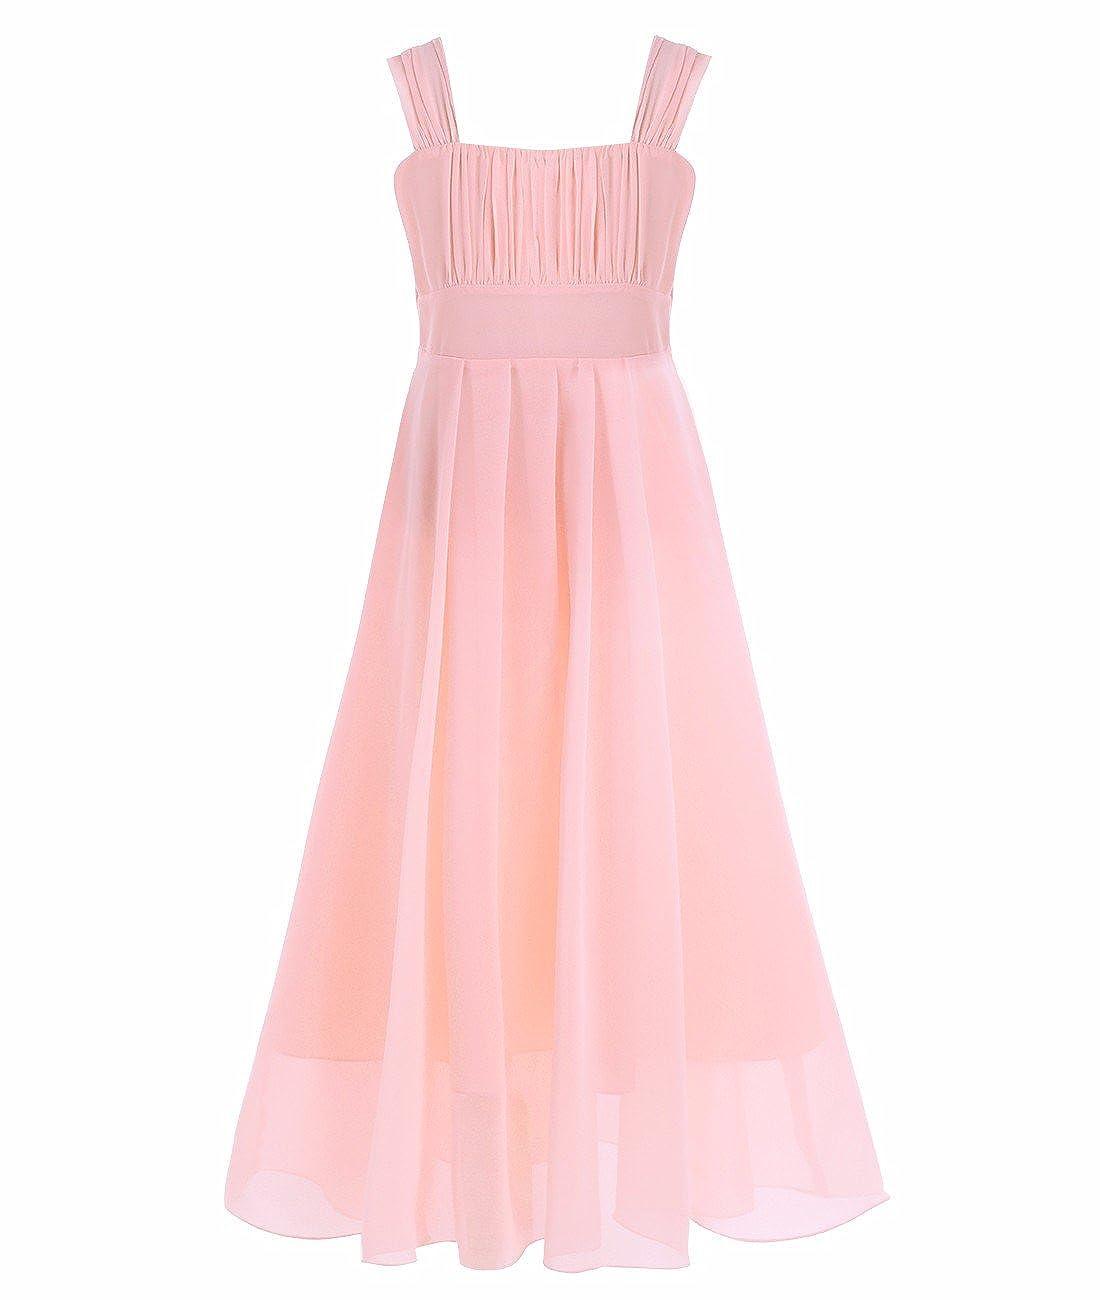 5f1c98a263de3 iEFiEL Big Girls Wedding Party Chiffon Long Dress Junior Bridesmaid Prom  Ball Gown